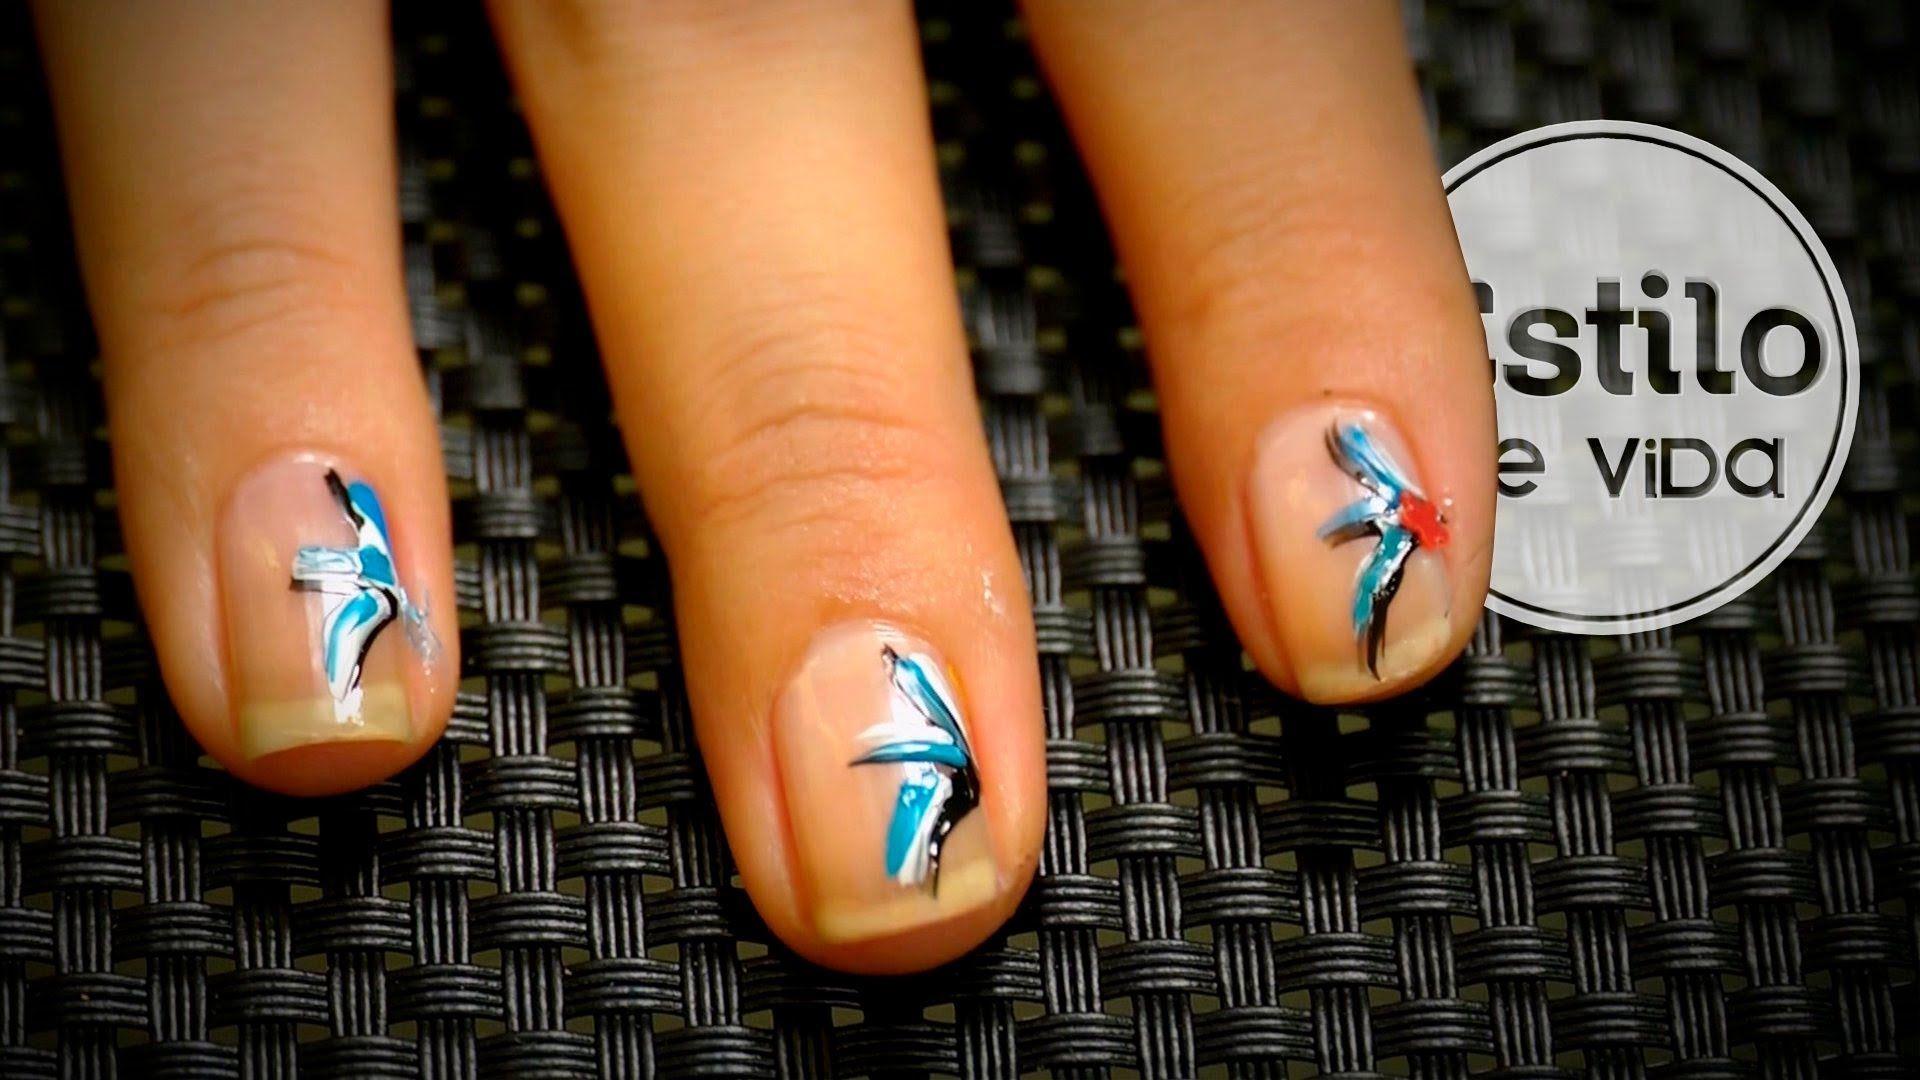 Diseño de uñas fácil | Manicura de líneas | NAIL ART | Pinterest